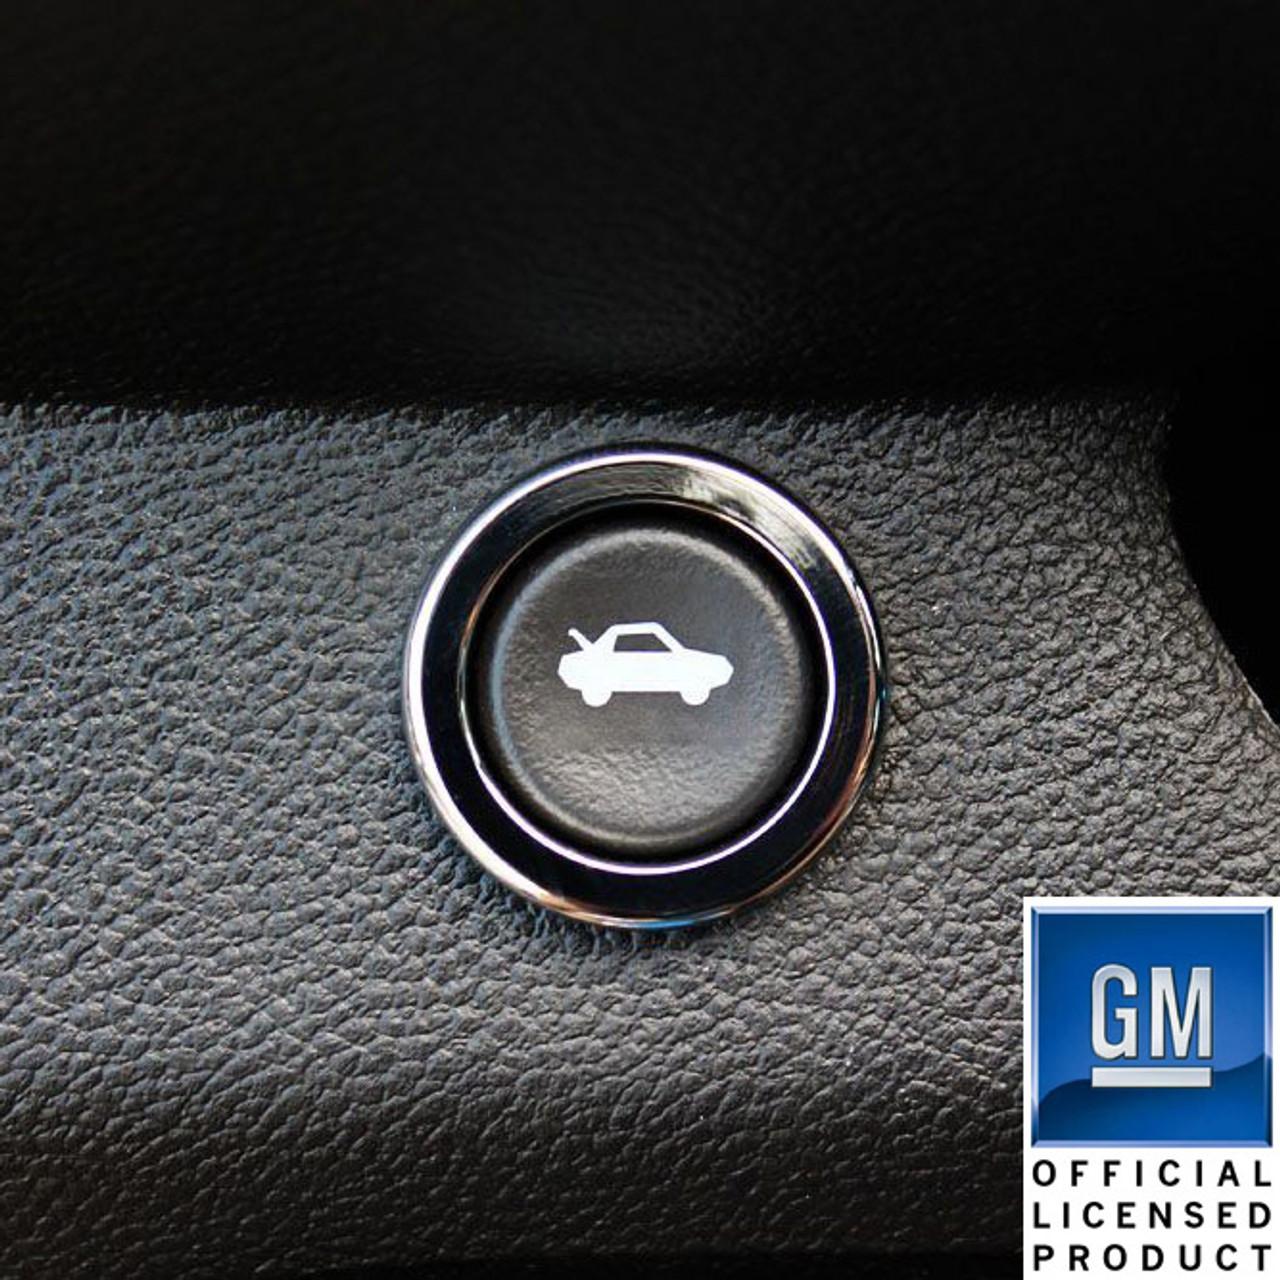 2010-2014 Chevrolet Camaro Billet Windshield Washer Control Knob Bezel Polished